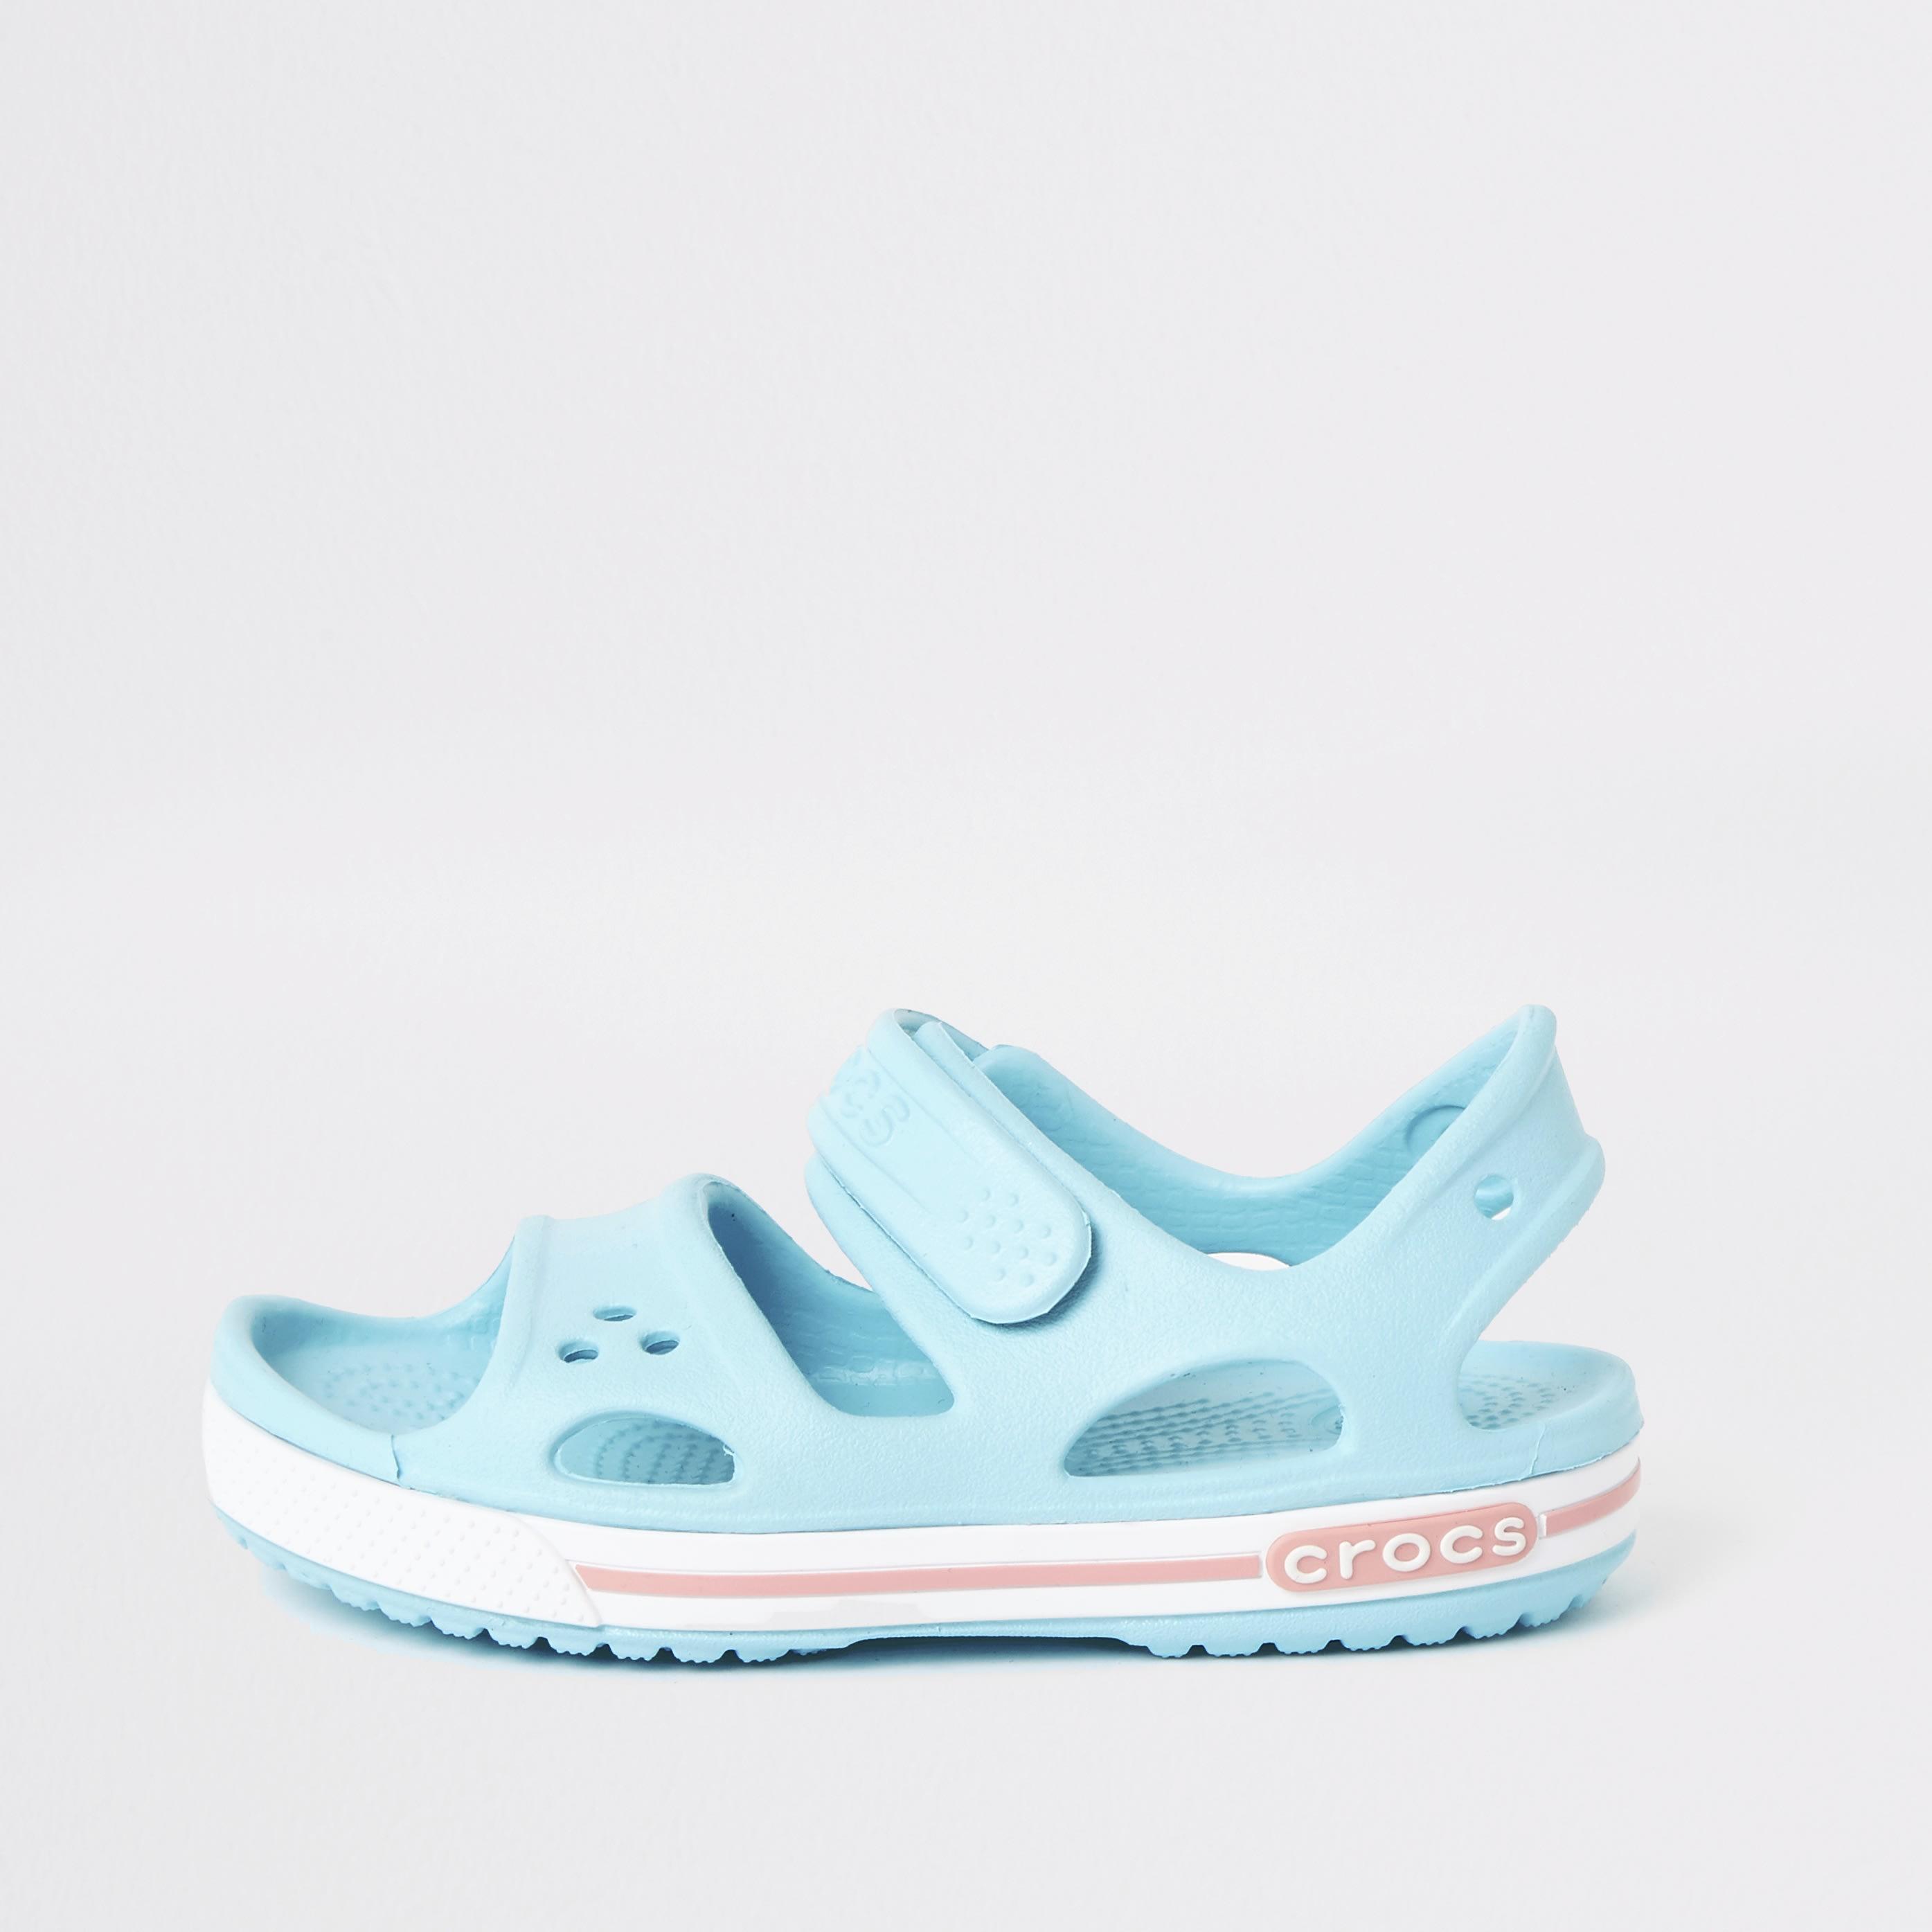 River Island Kids Crocs light Blue bayaband sandals (2)